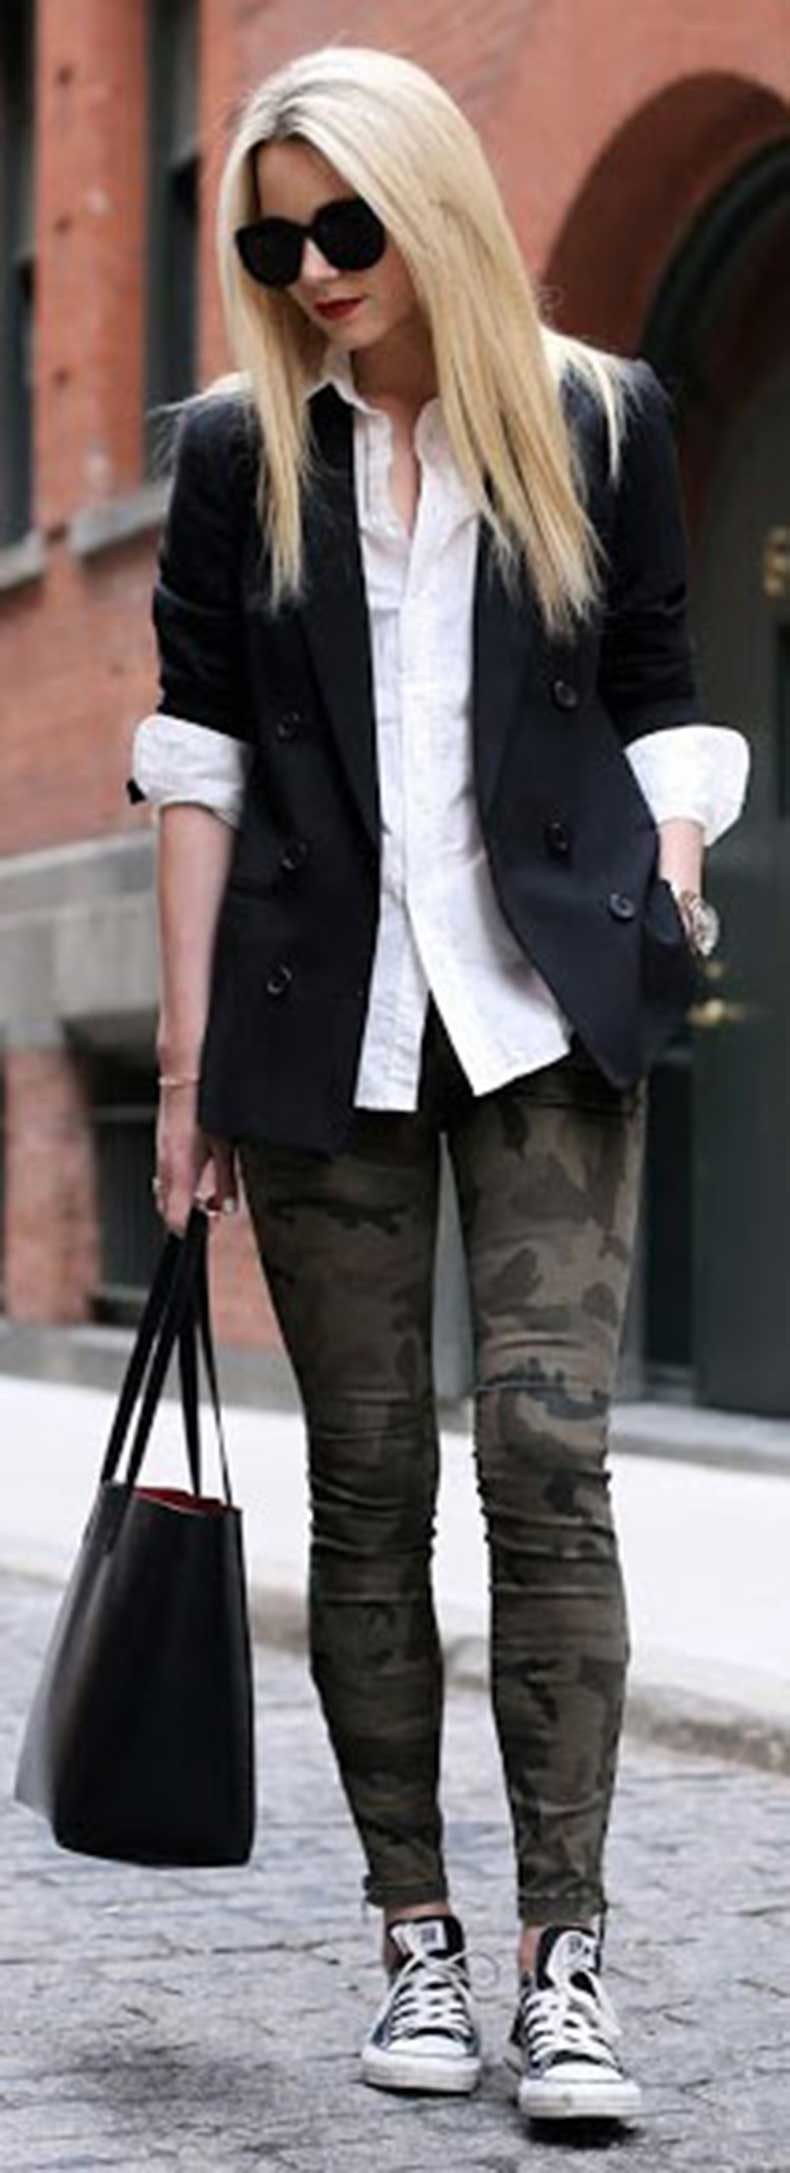 Camo-Jeans-Black-Blazer-Outfit